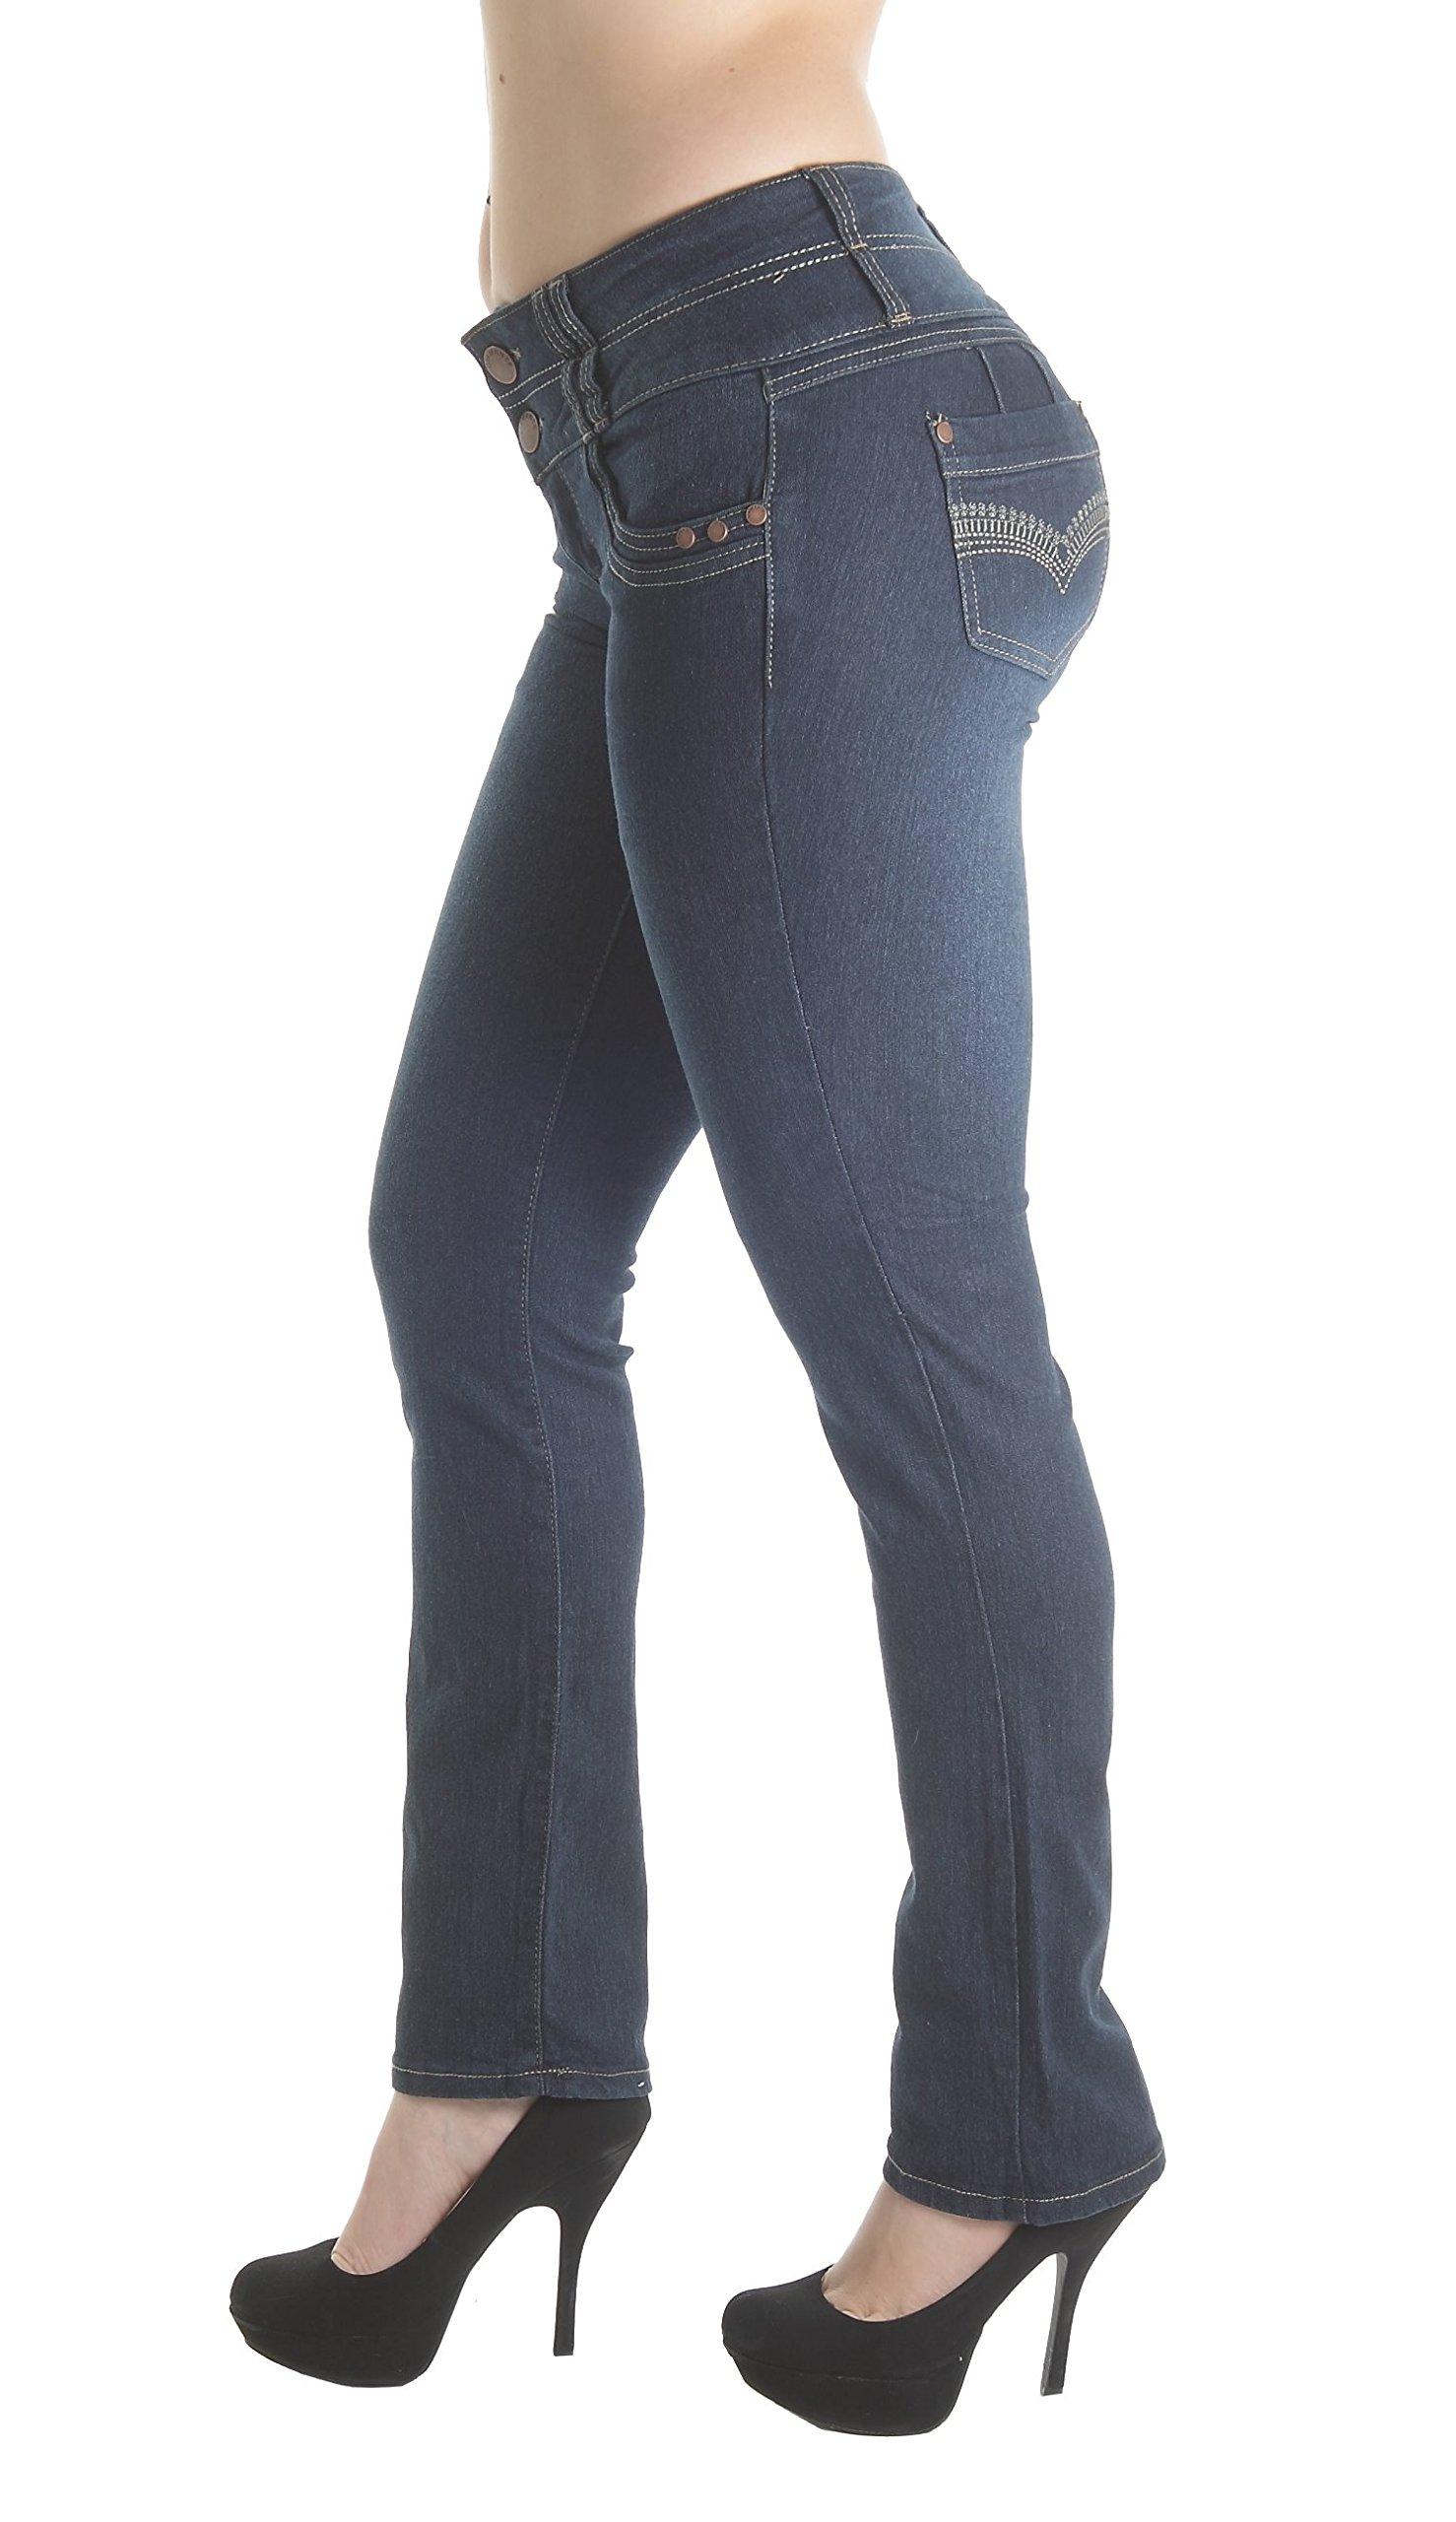 Fashion2Love FCH159BT – Colombian Design, Butt Lift, Levanta Cola, Mid Waist, Boot Leg Jeans in Navy Size 0